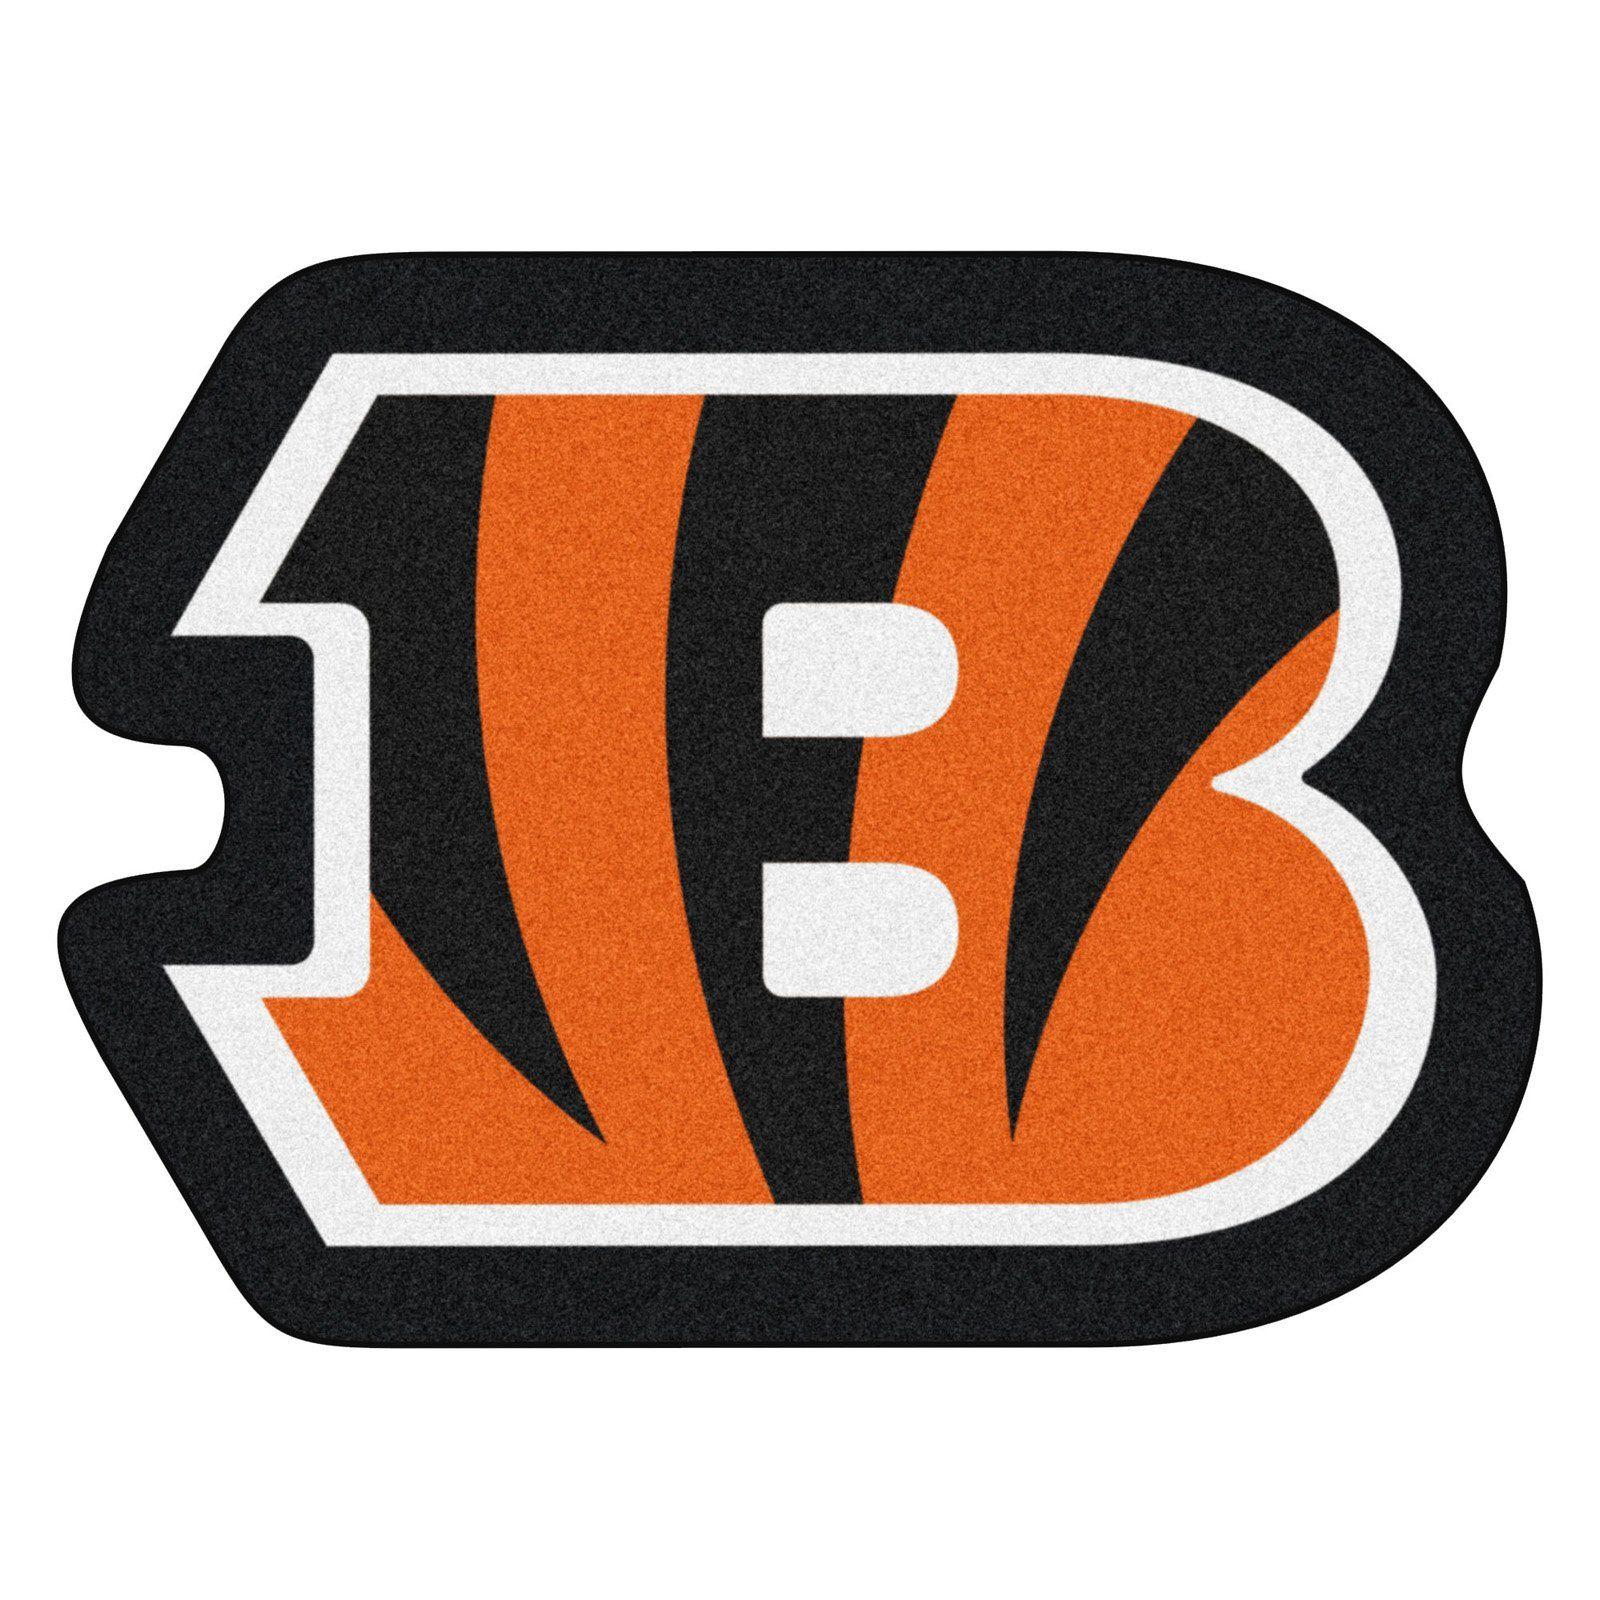 Fan Mats NFL Football Mascot Indoor Rug Cincinnati